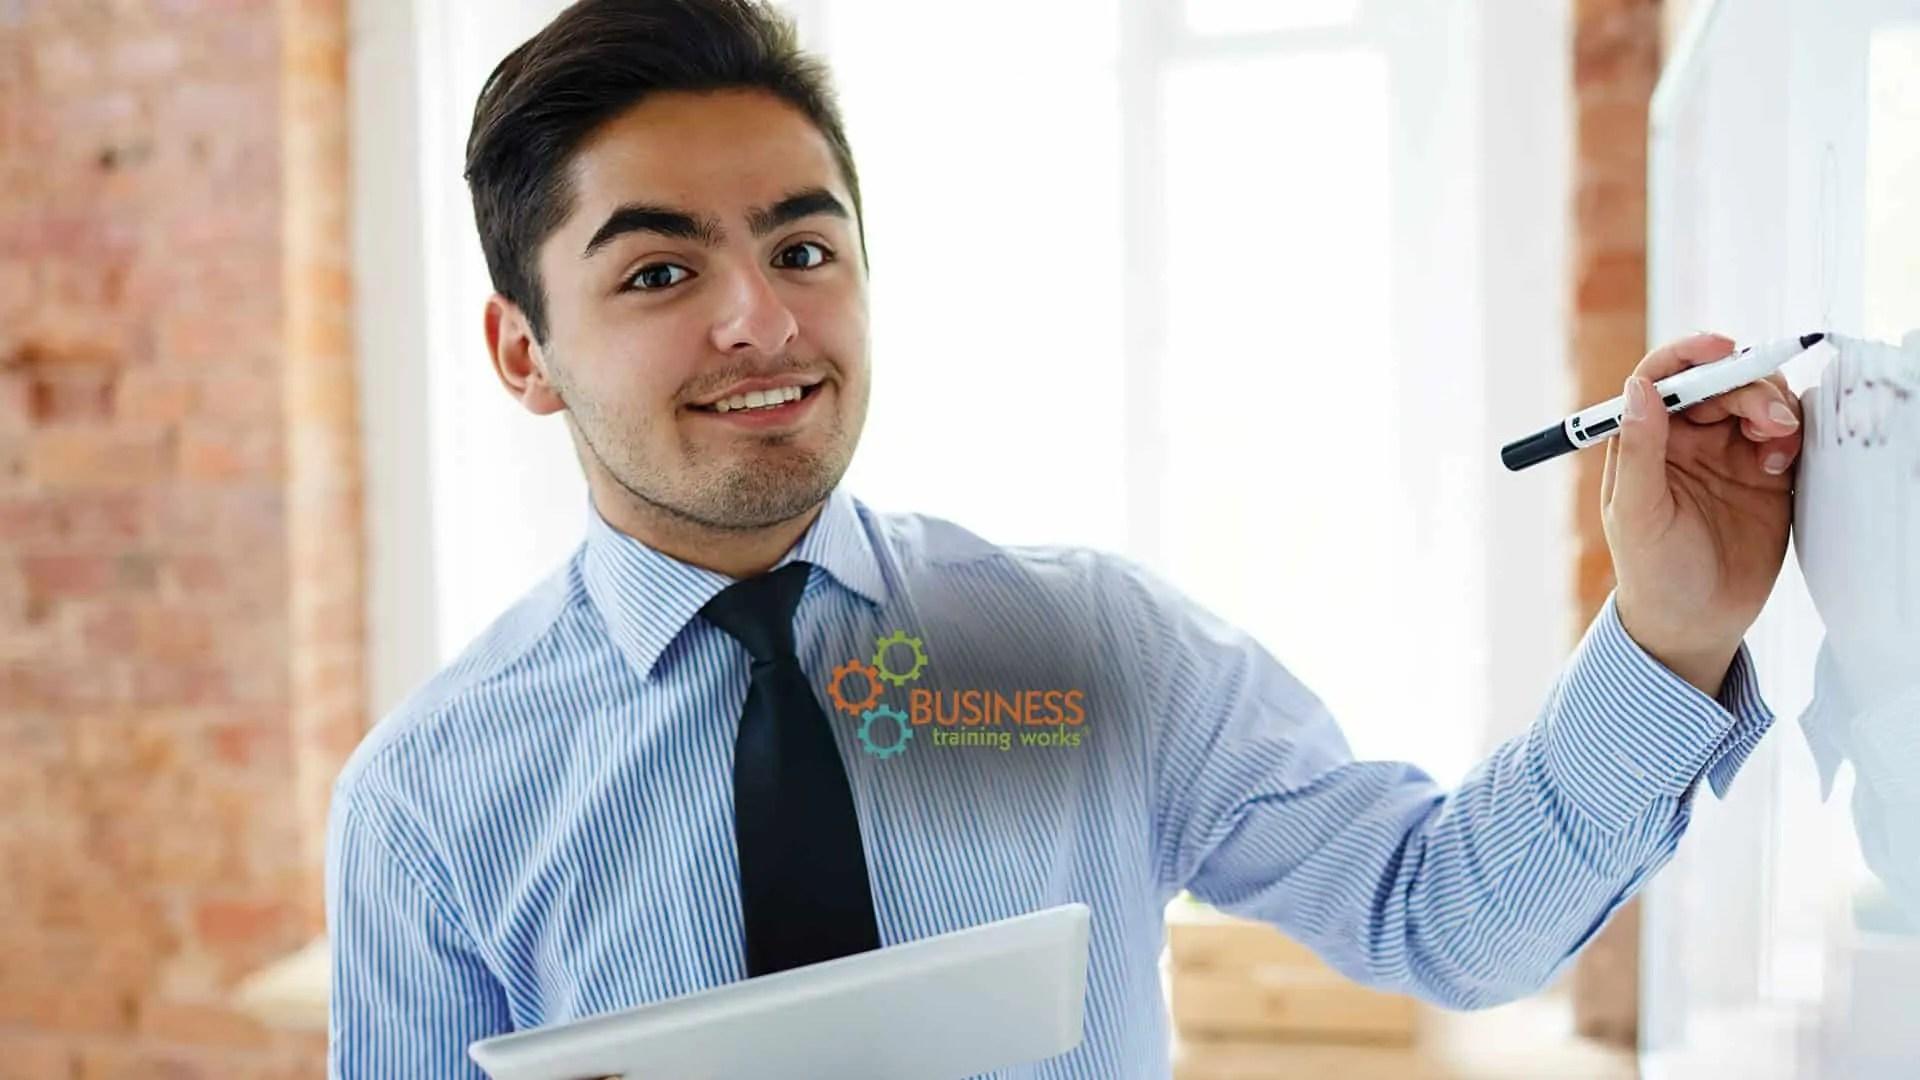 Facilitation Skills Training Courses and Workshops